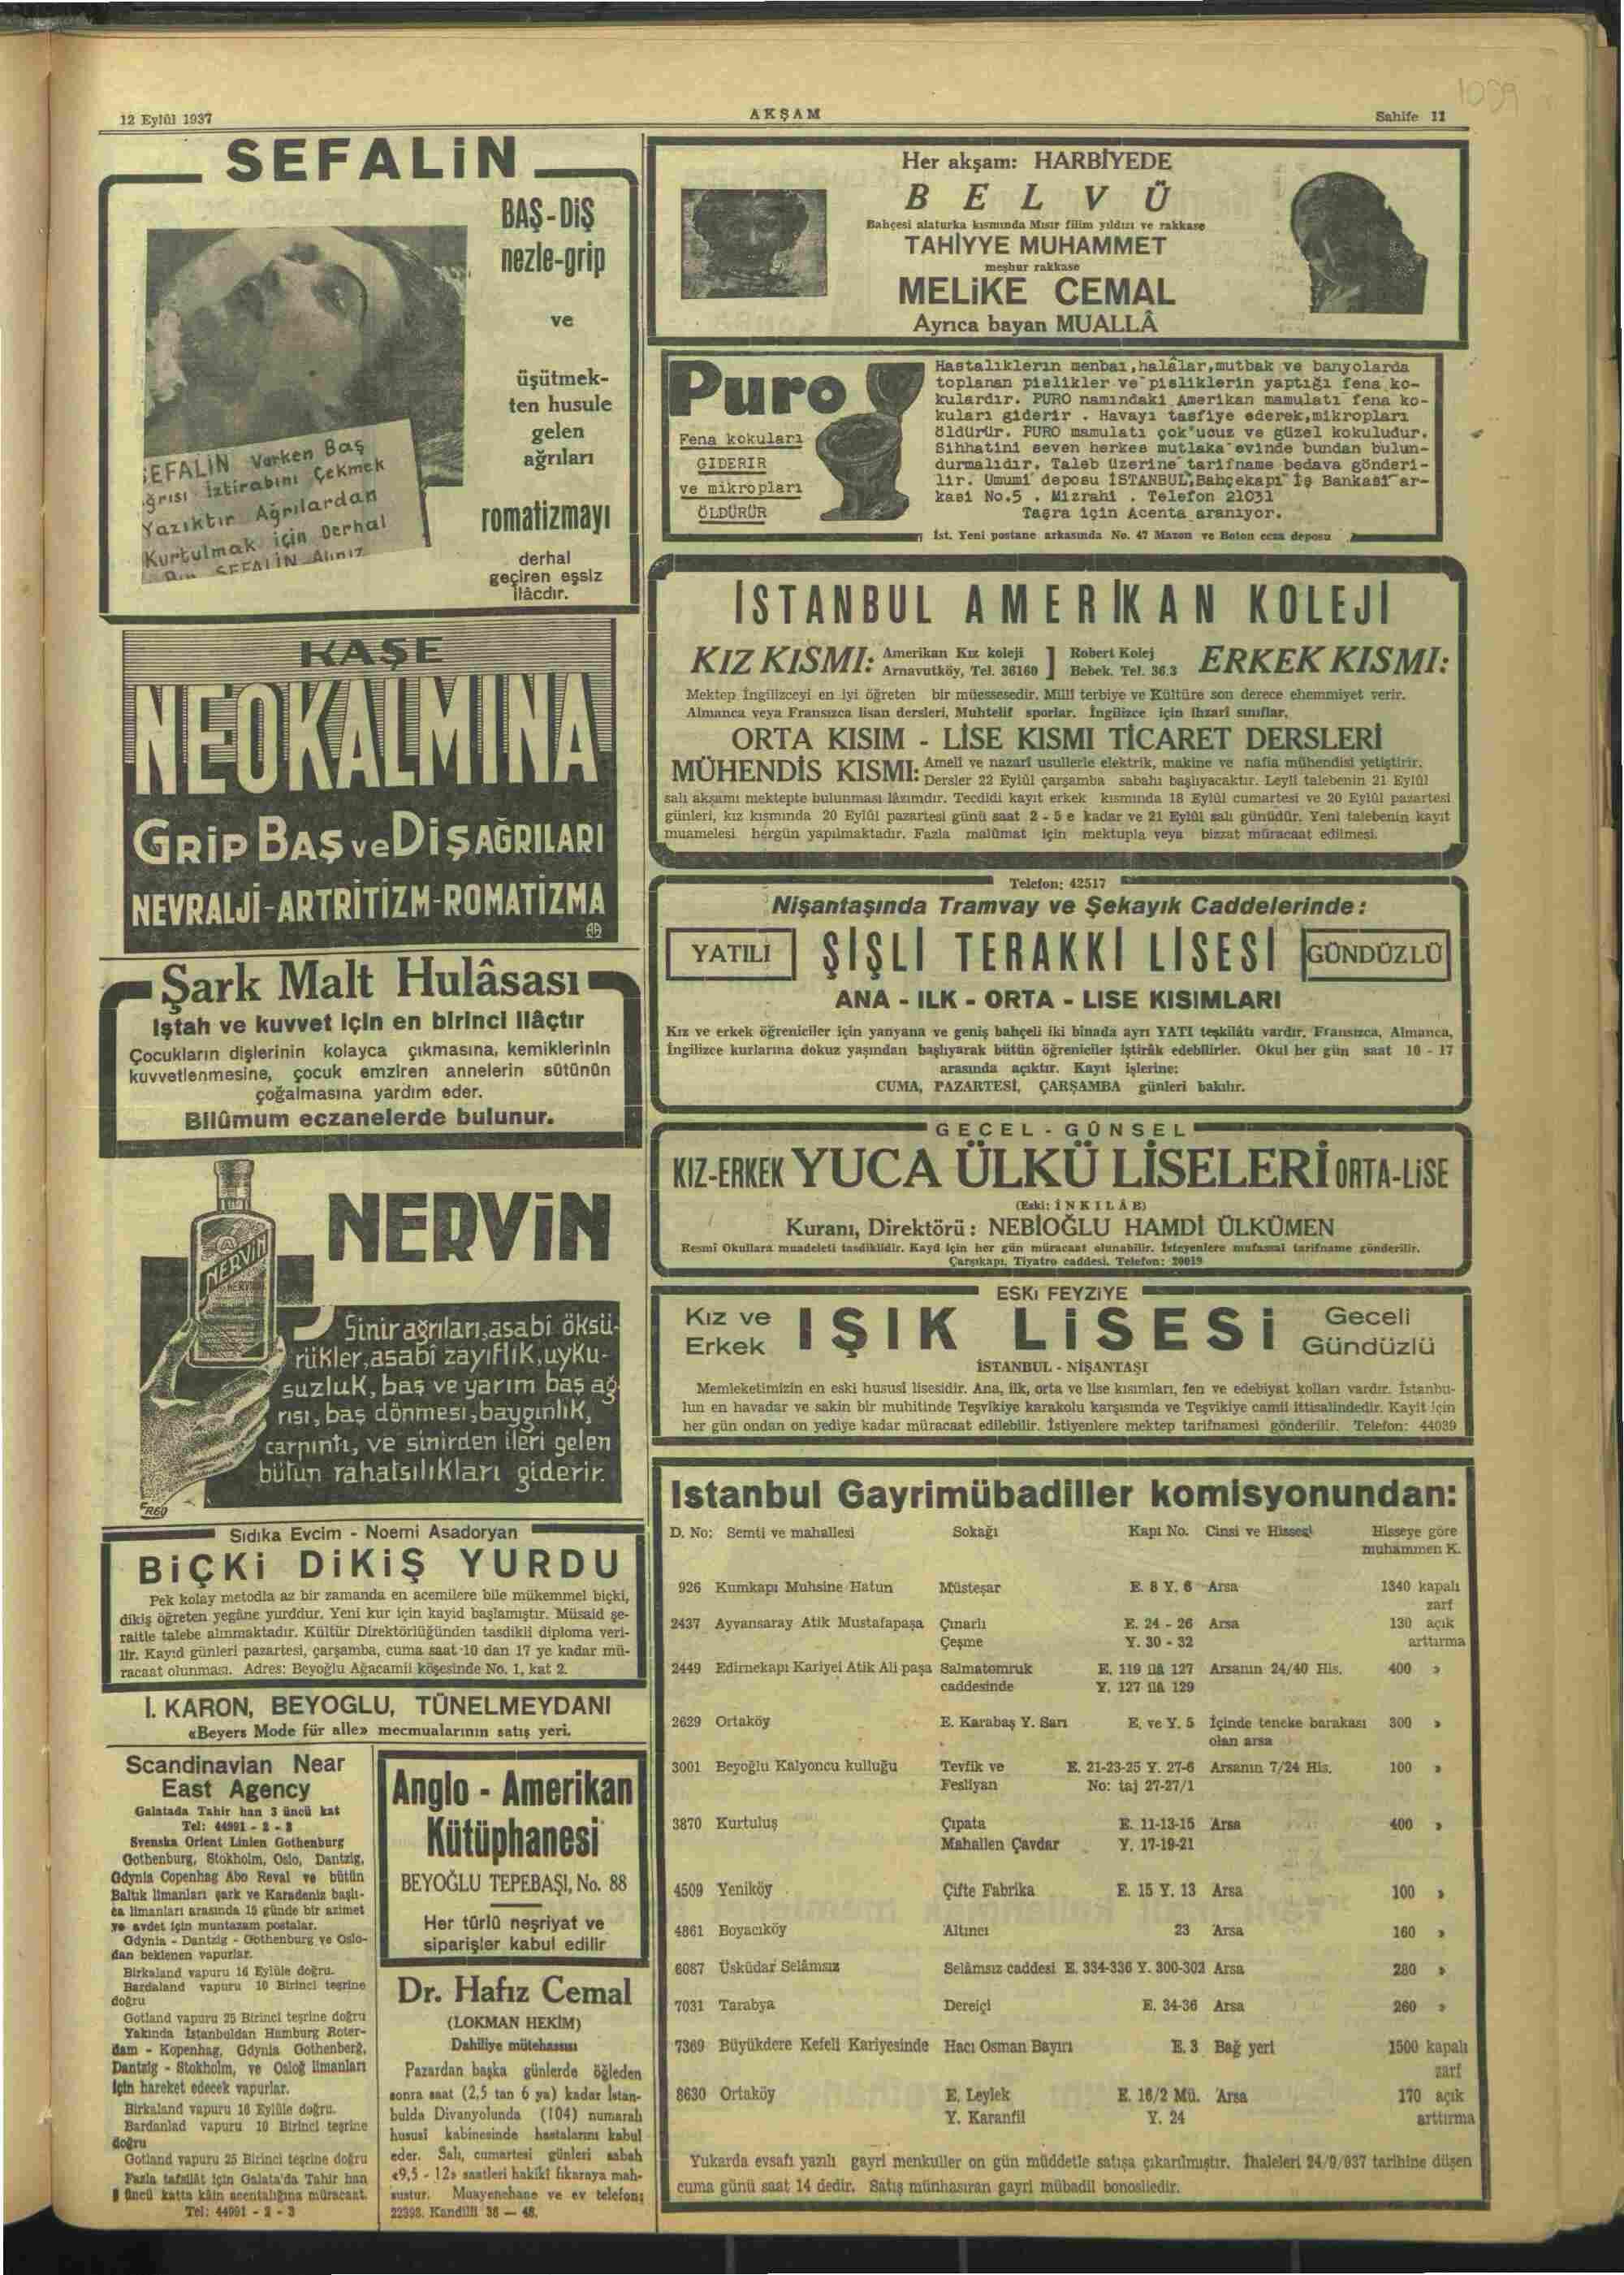 12 Eylül 1937 Tarihli Akşam Dergisi Sayfa 11